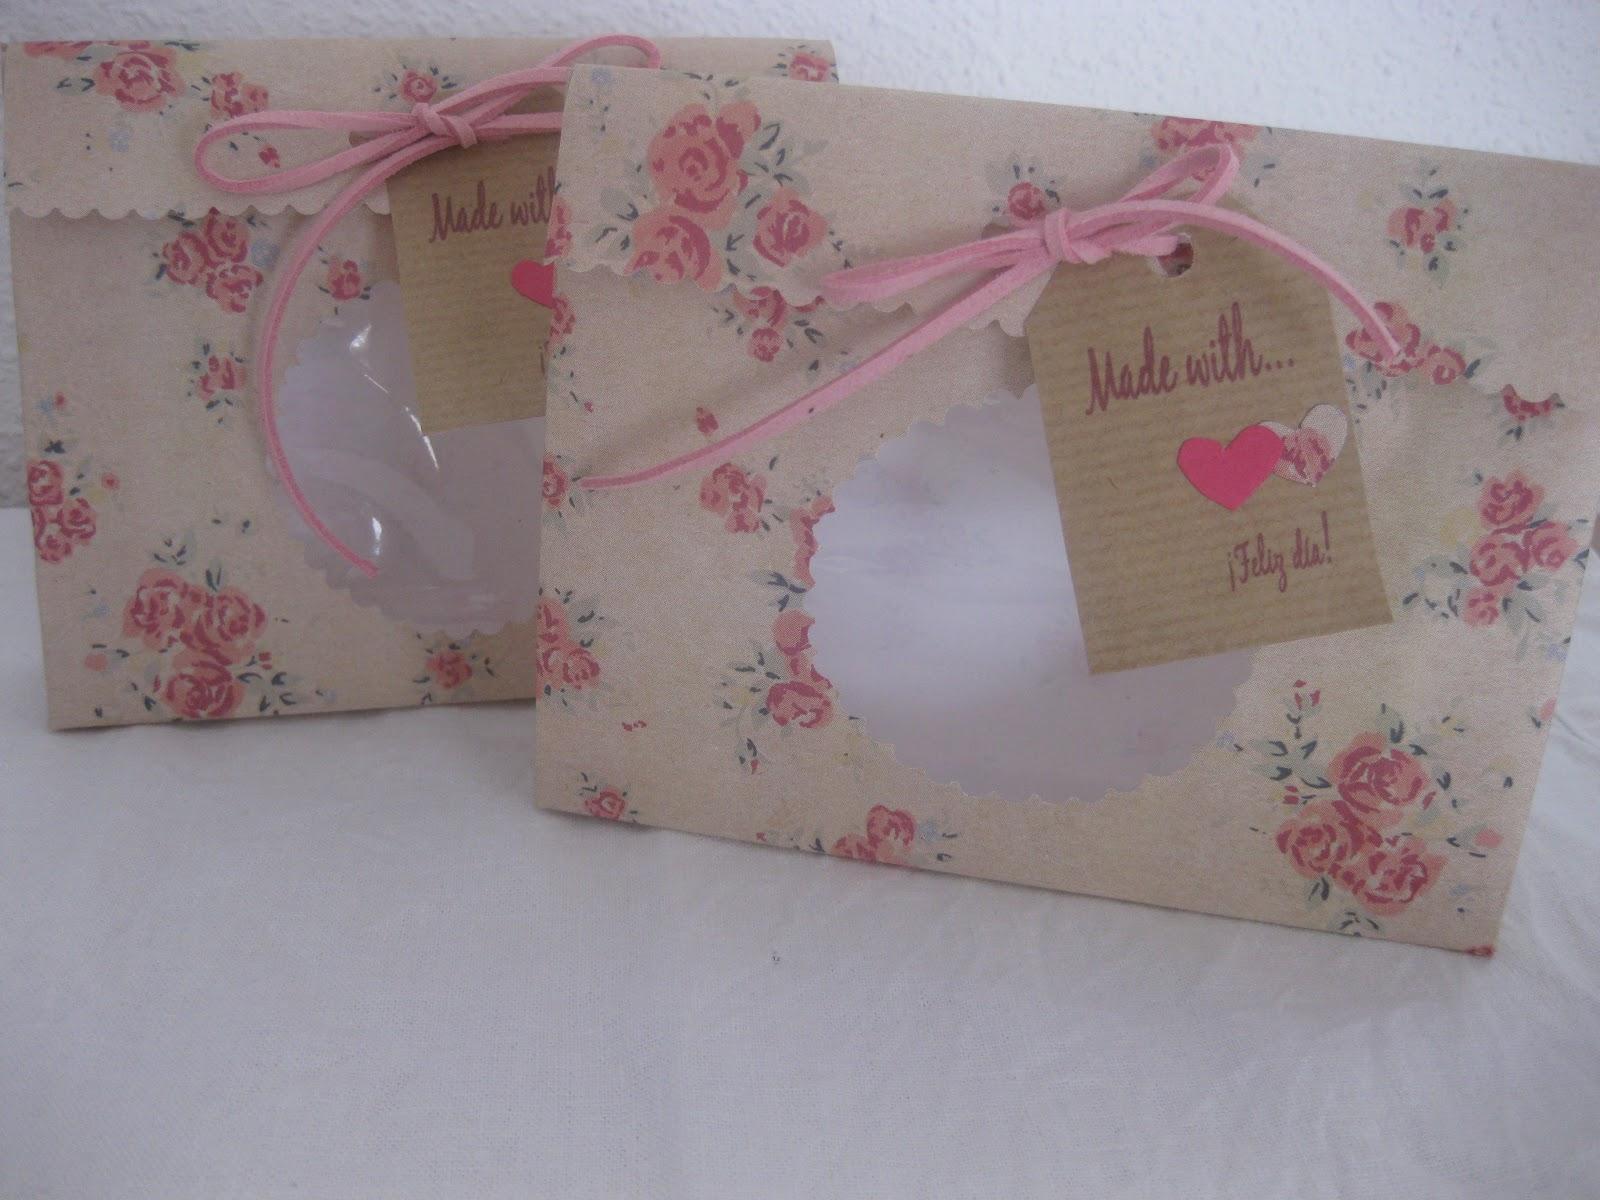 Como hacer bolsas de papel para regalo imagui - Como hacer bolsas de regalo ...